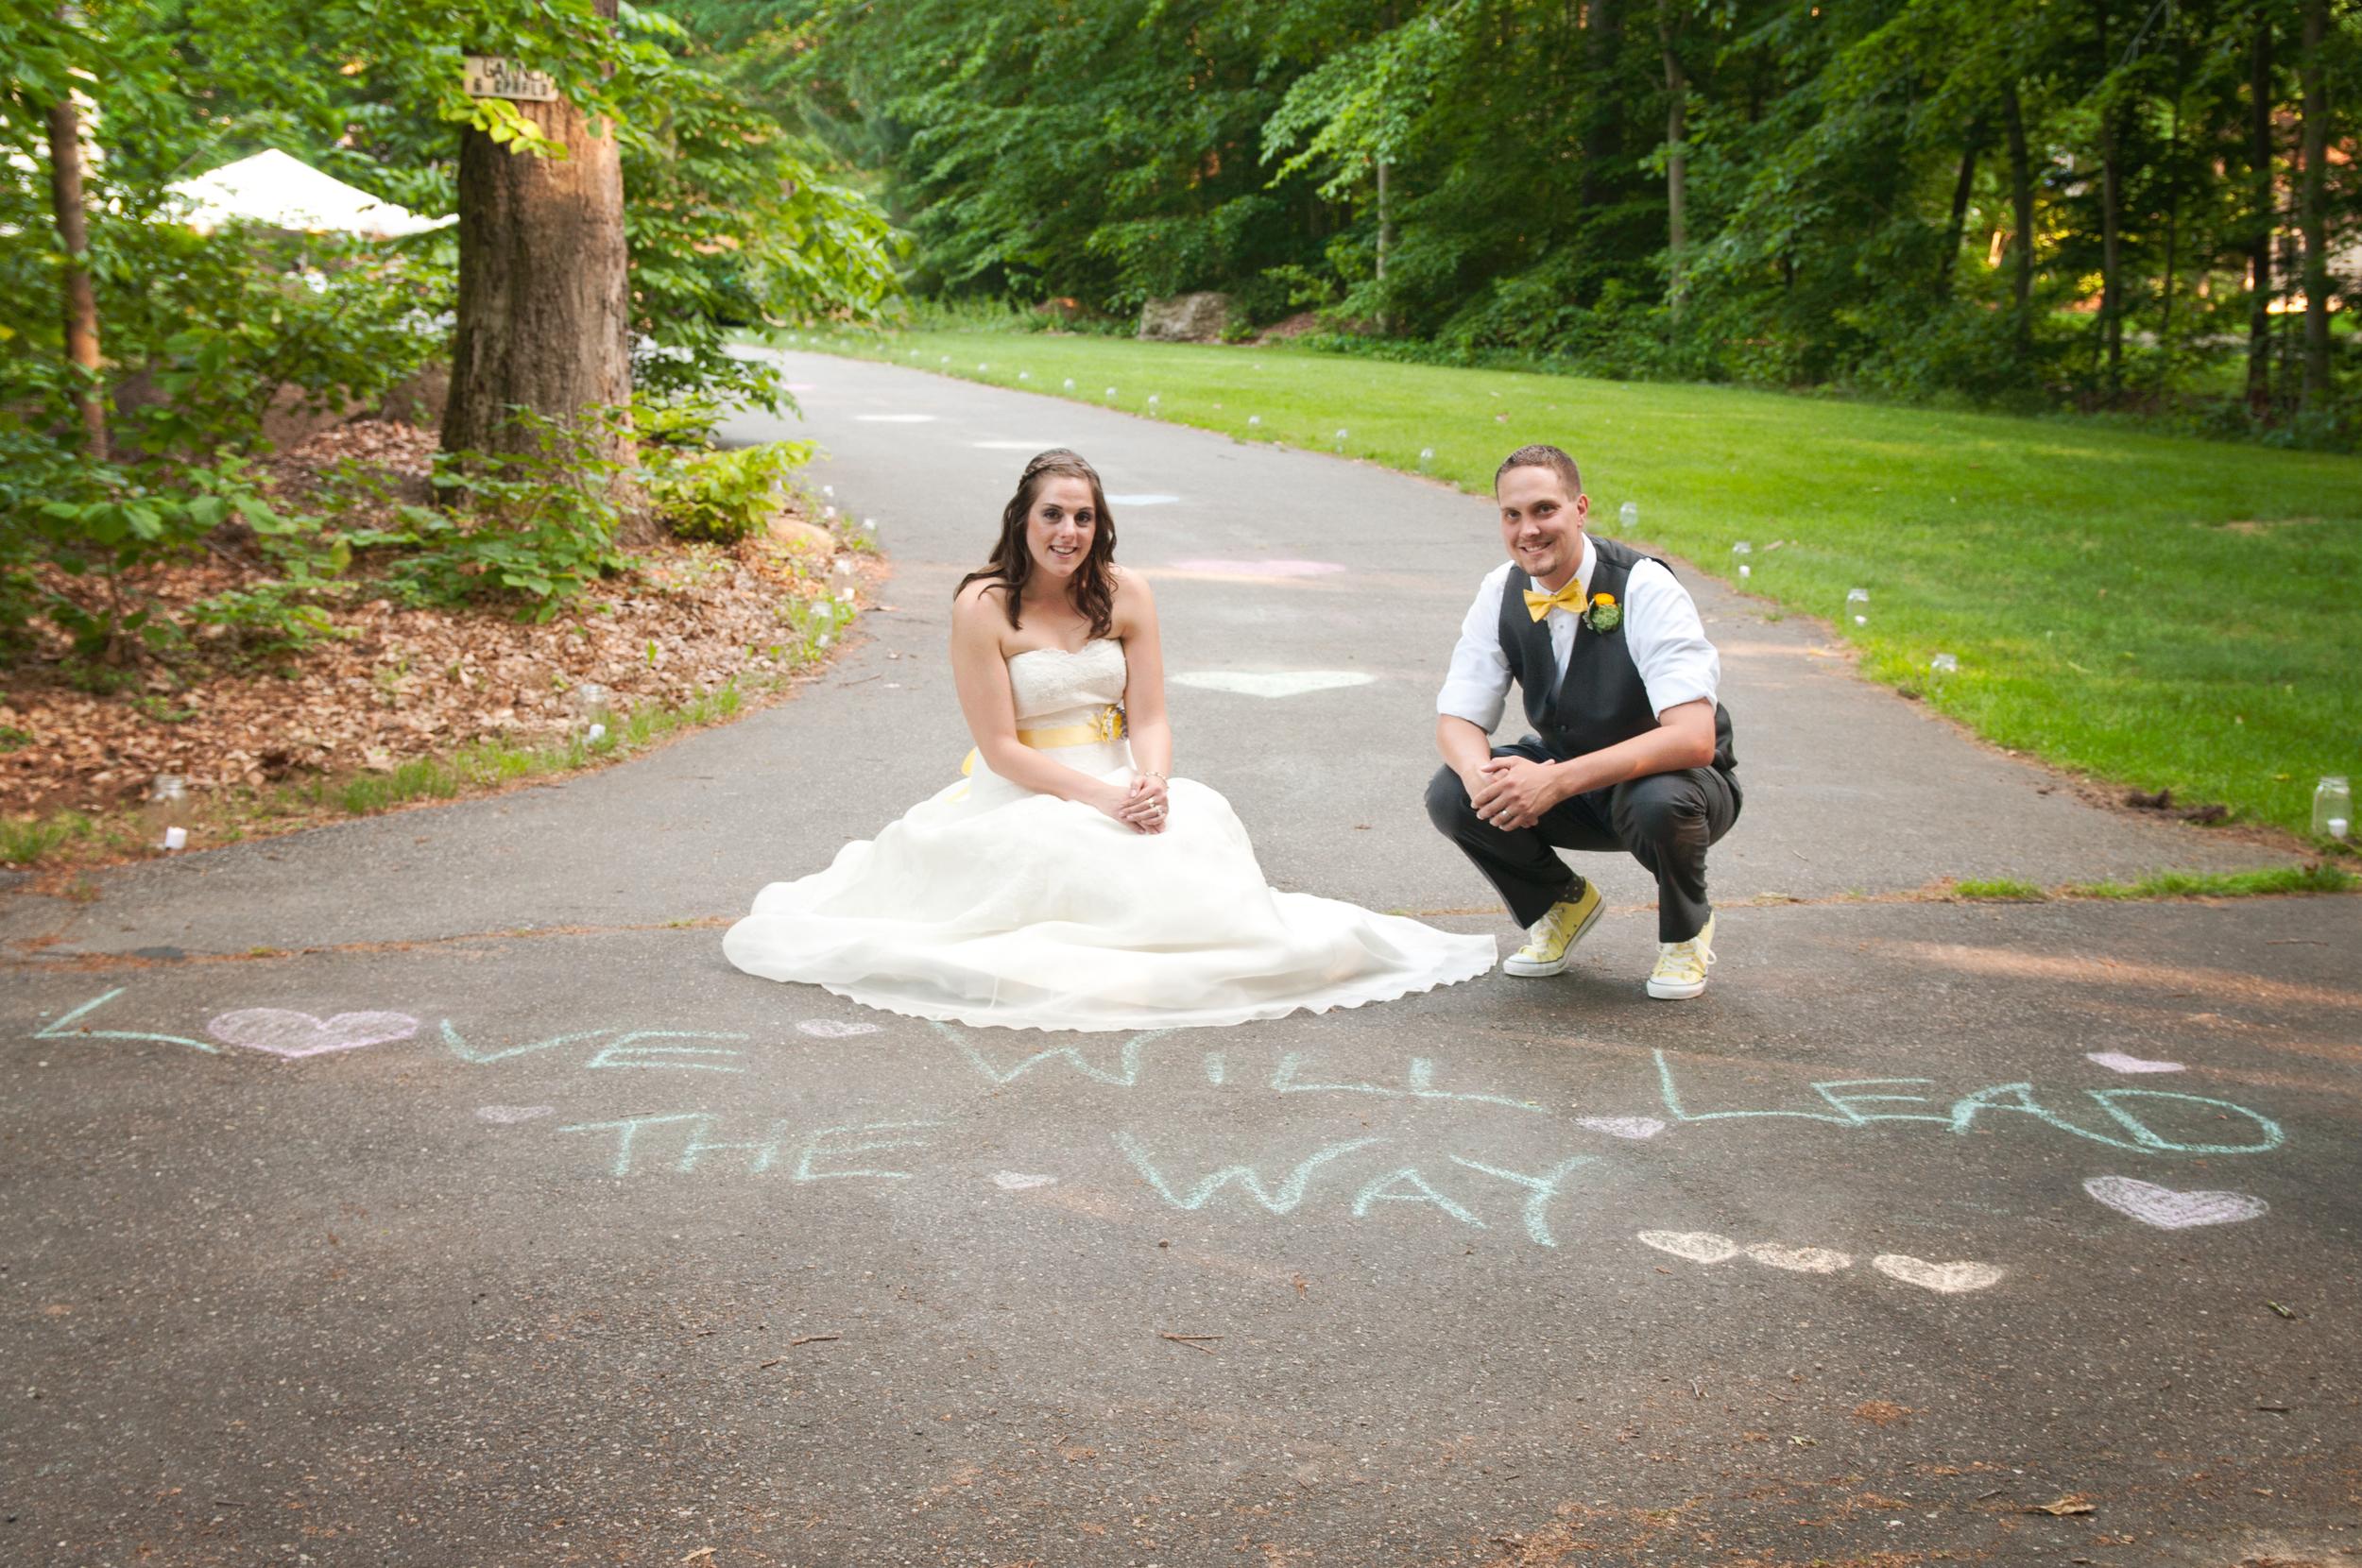 Angela_Chicoski_CT_wedding_photographer_031.jpg